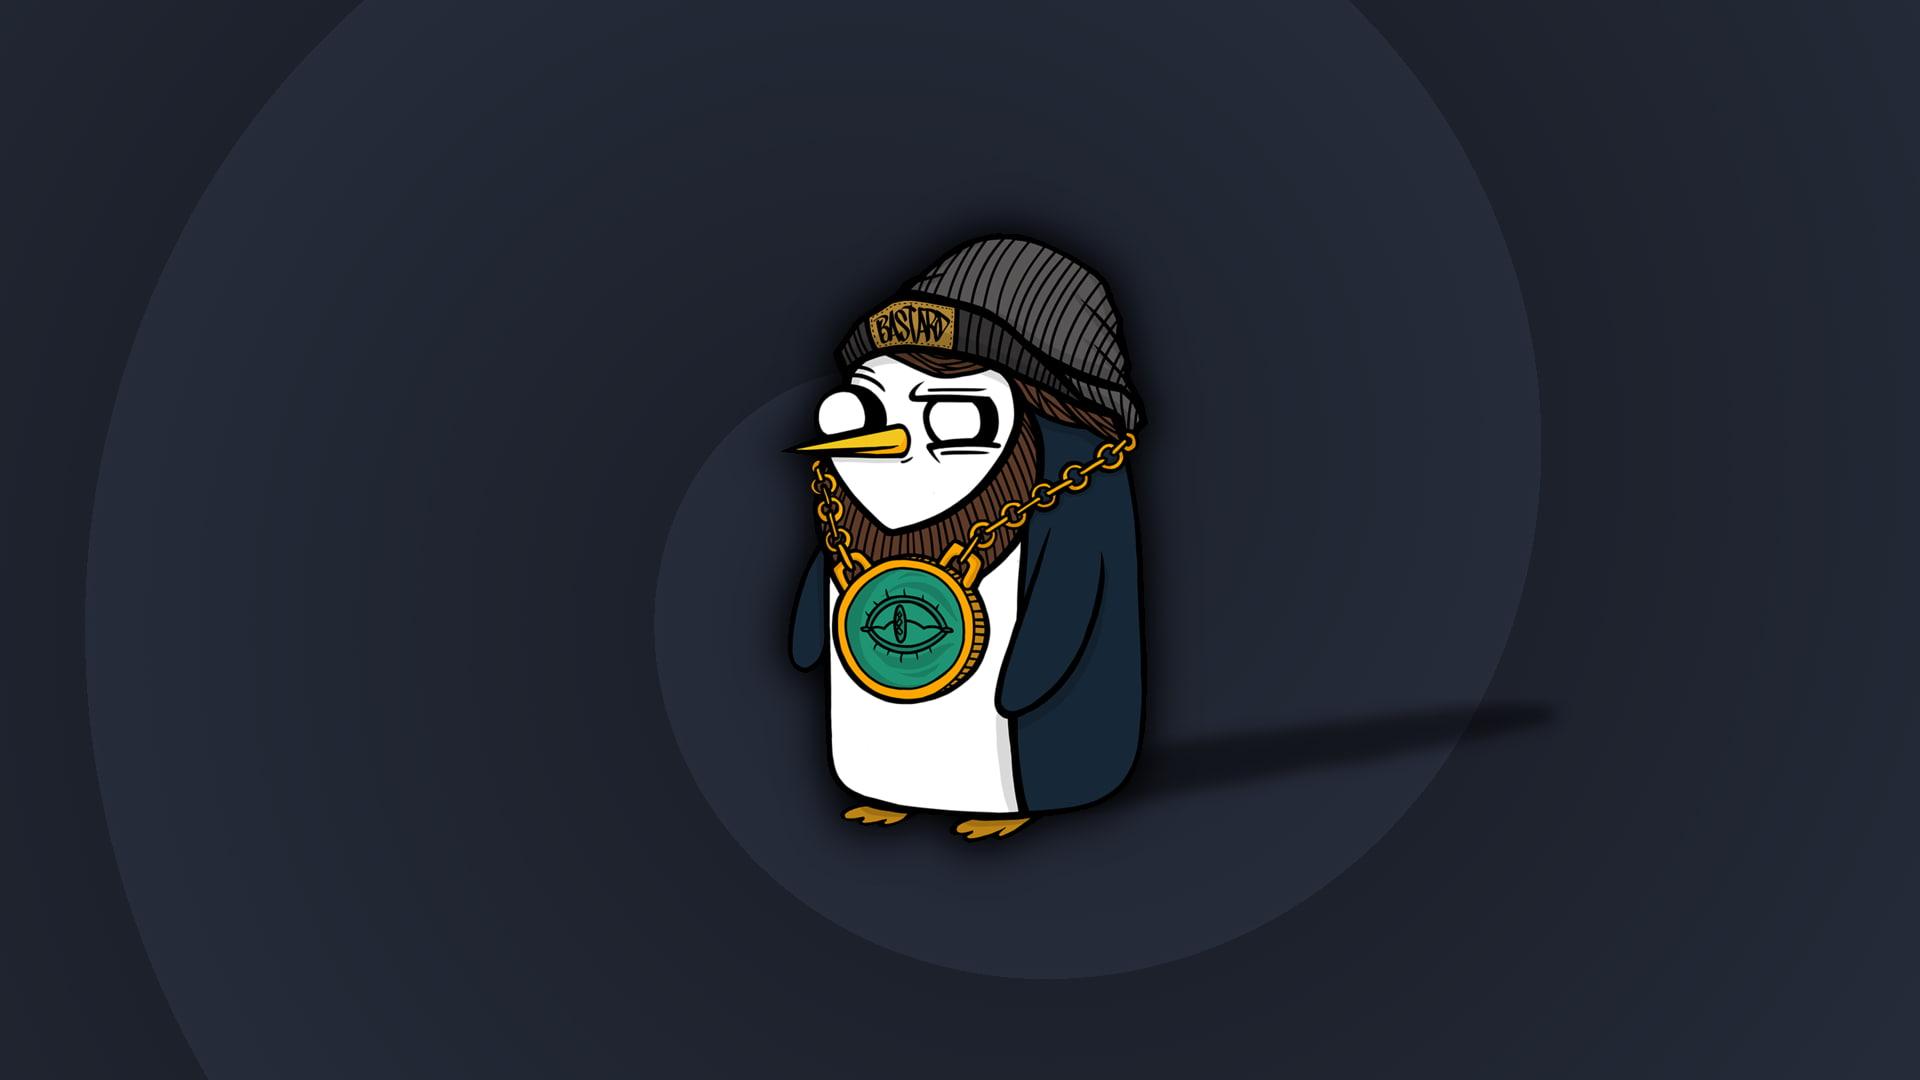 HD wallpaper Linux Gunter penguins minimalism Wallpaper Flare 1920x1080